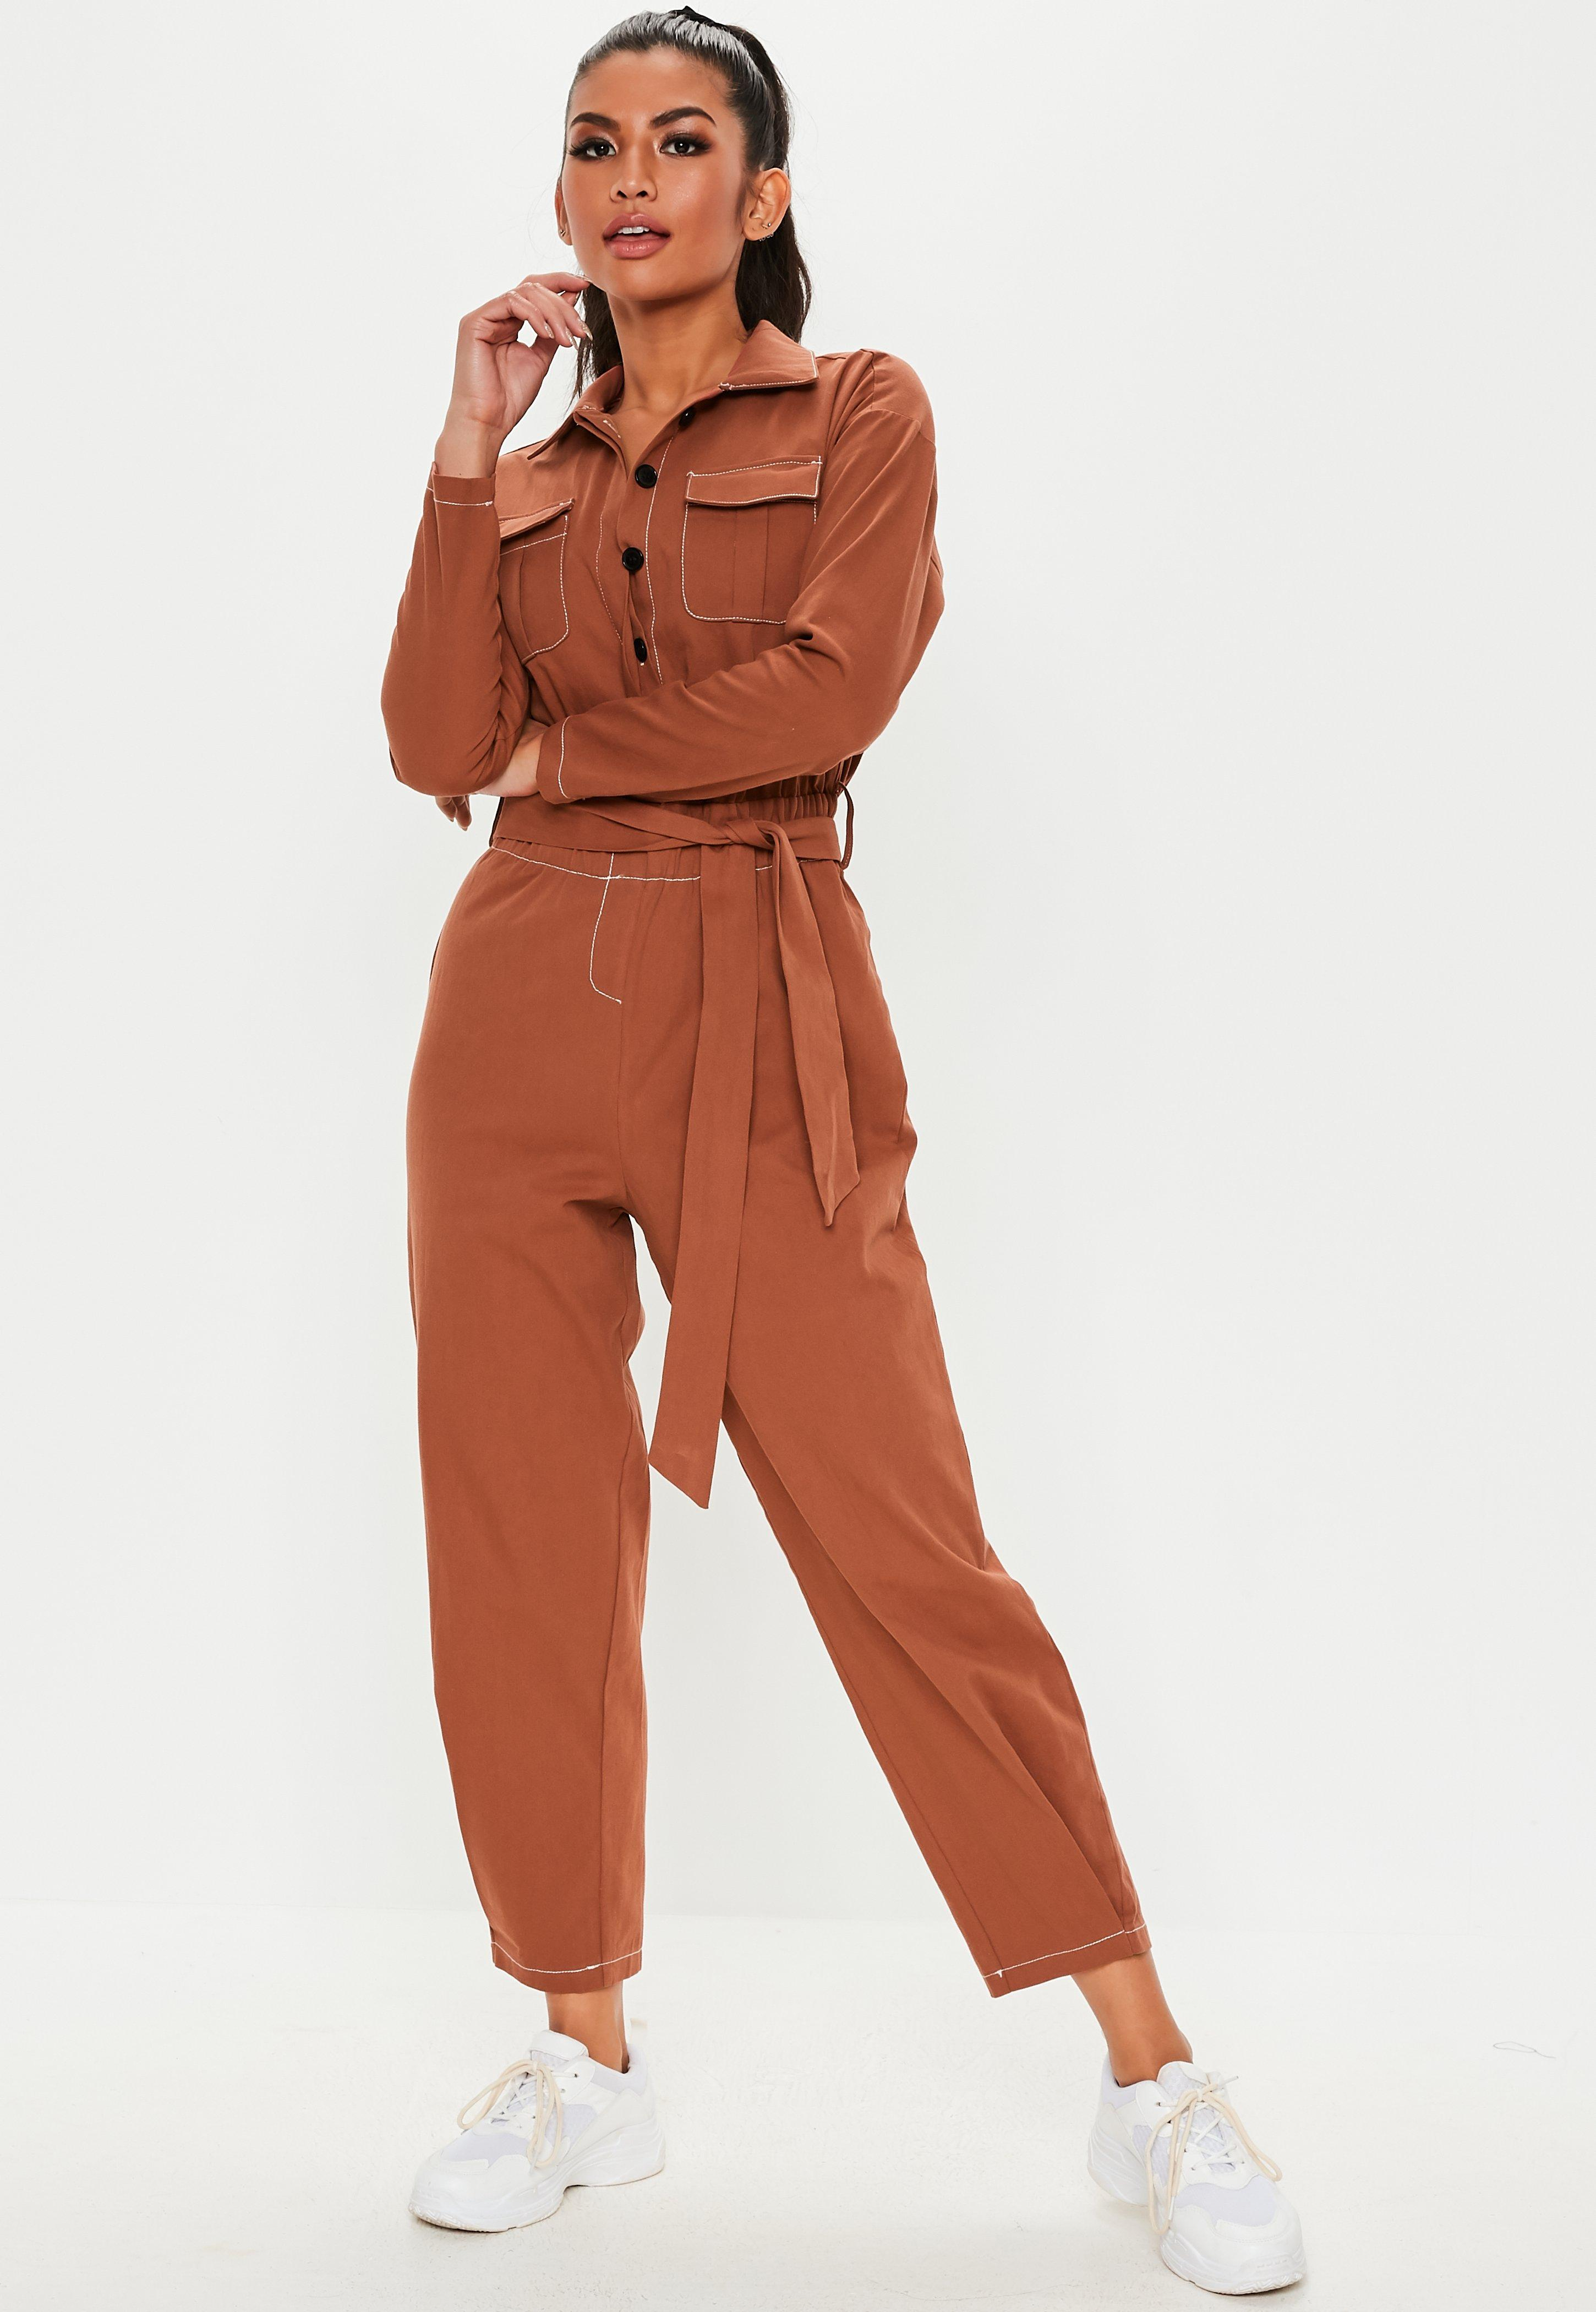 ed7f18783d5 Long Sleeve Jumpsuits - Missguided Australia